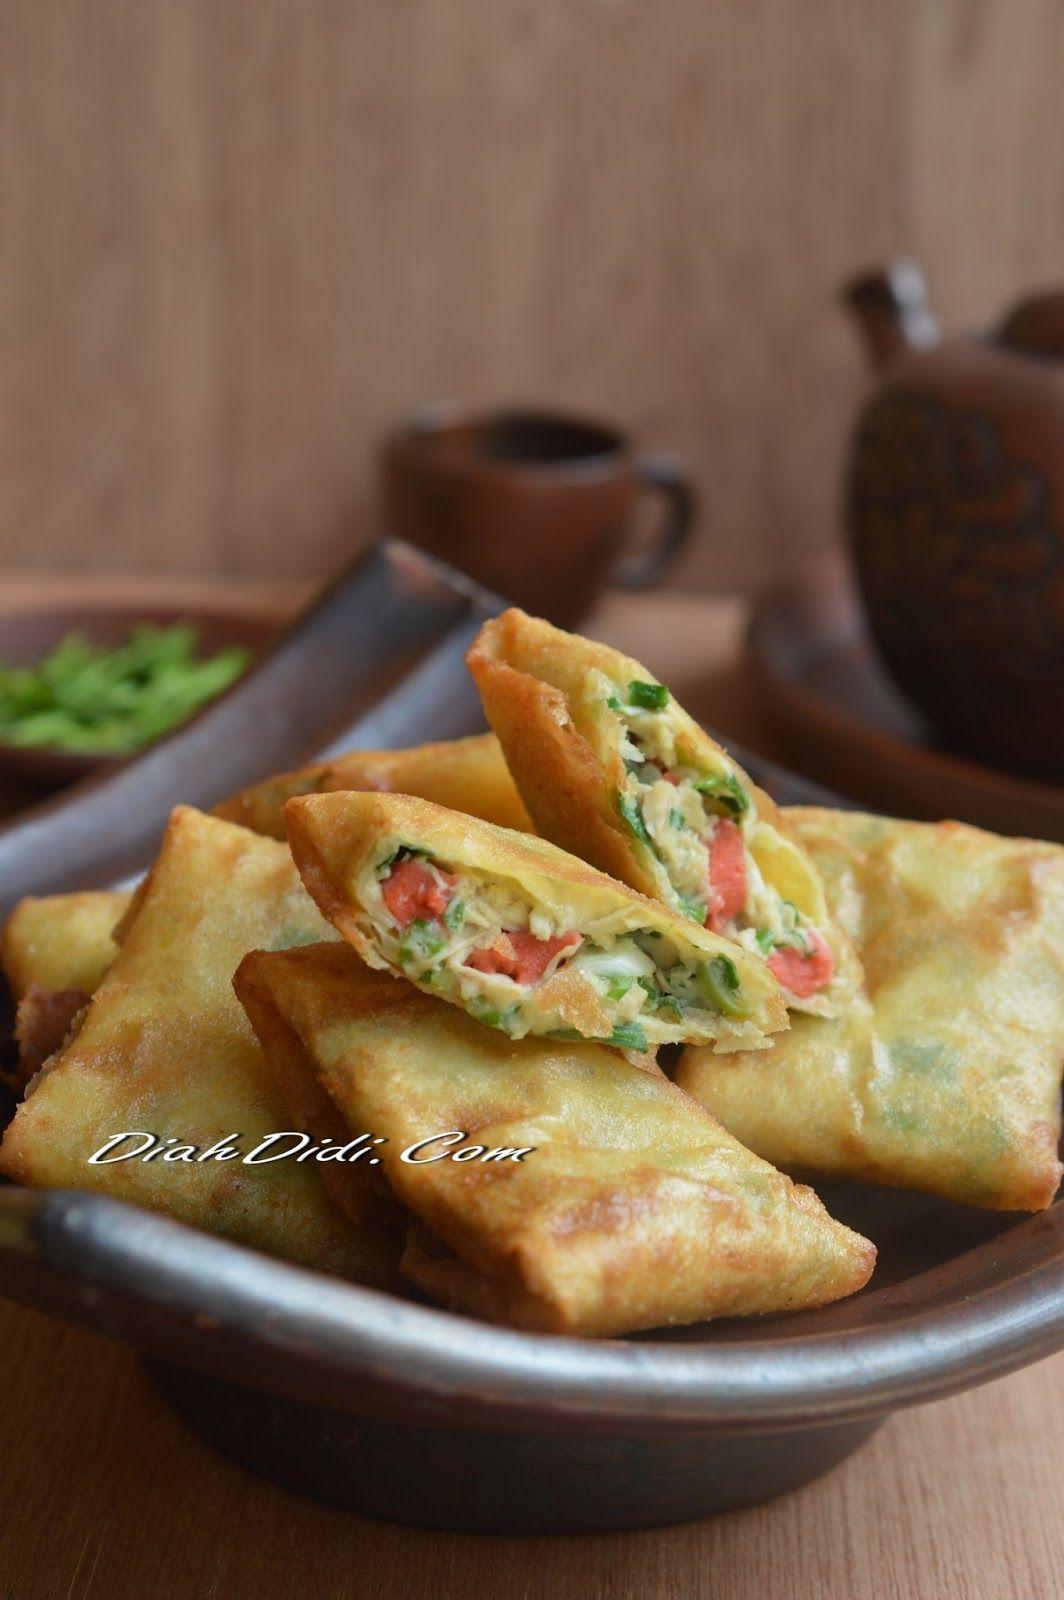 Diah Didi S Kitchen Martabak Mini Sosis Resep Masakan Ramadhan Fotografi Makanan Ide Makanan